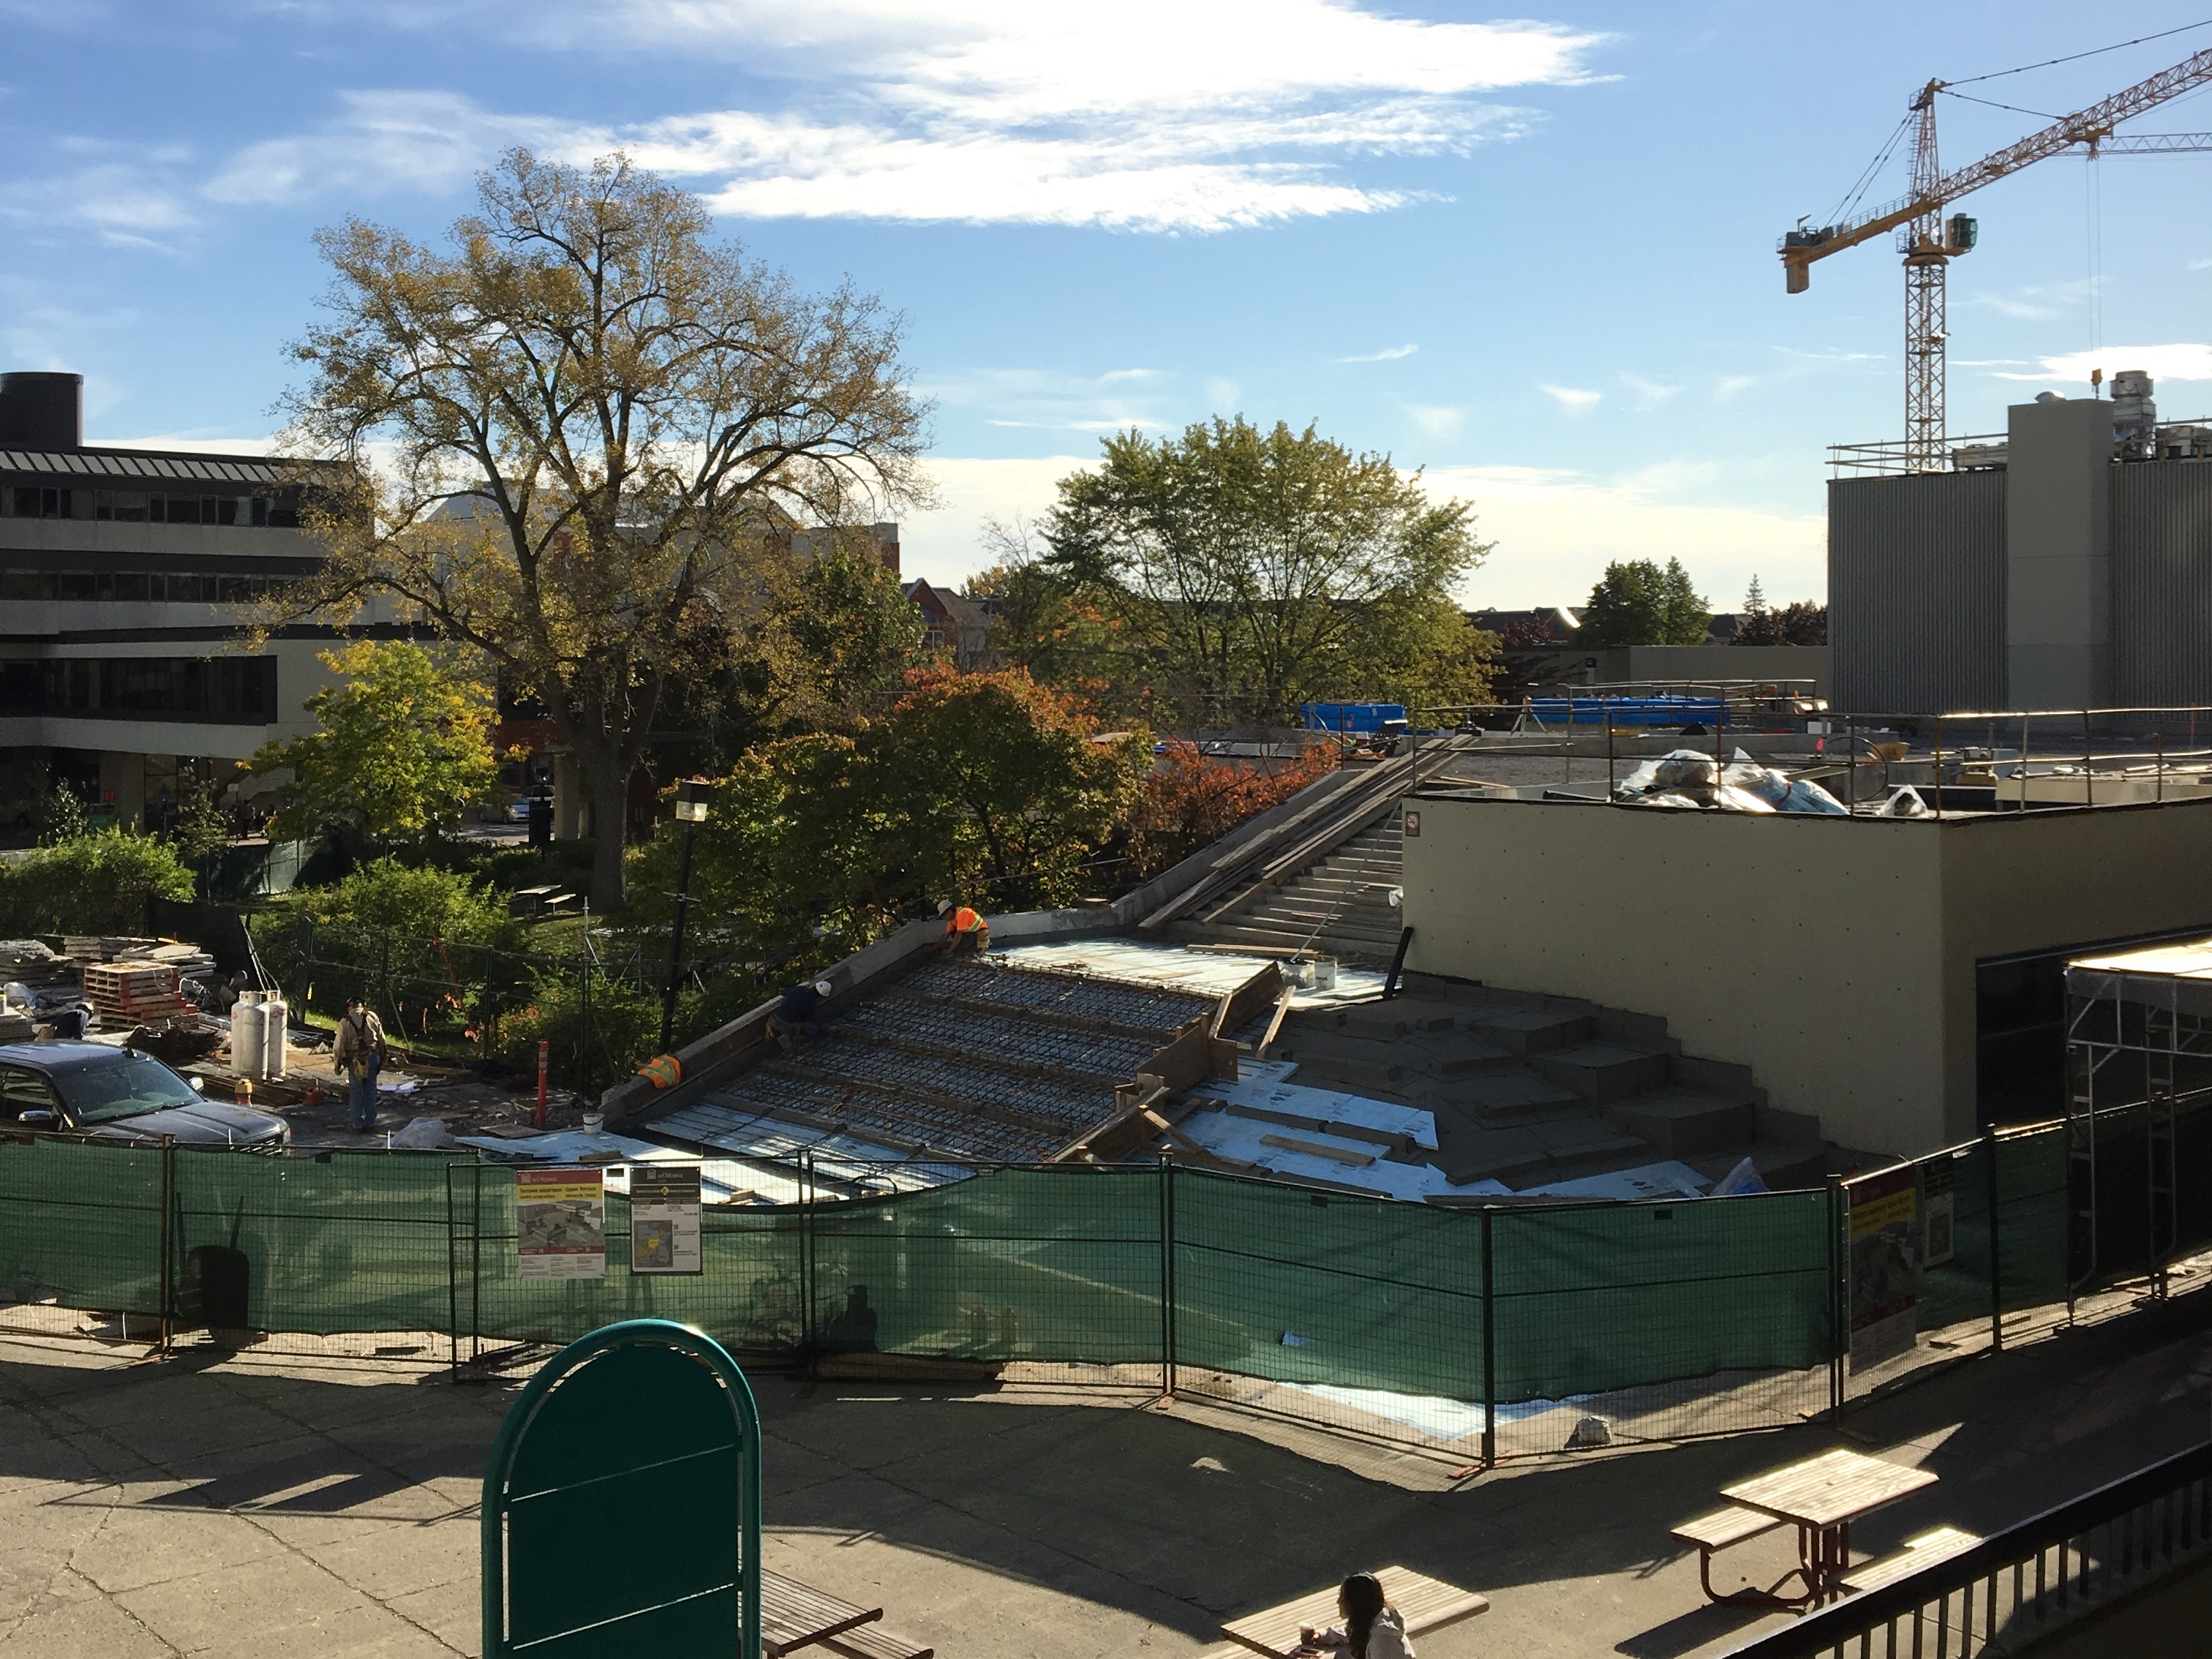 Construction at UCU Terrace at sunrise